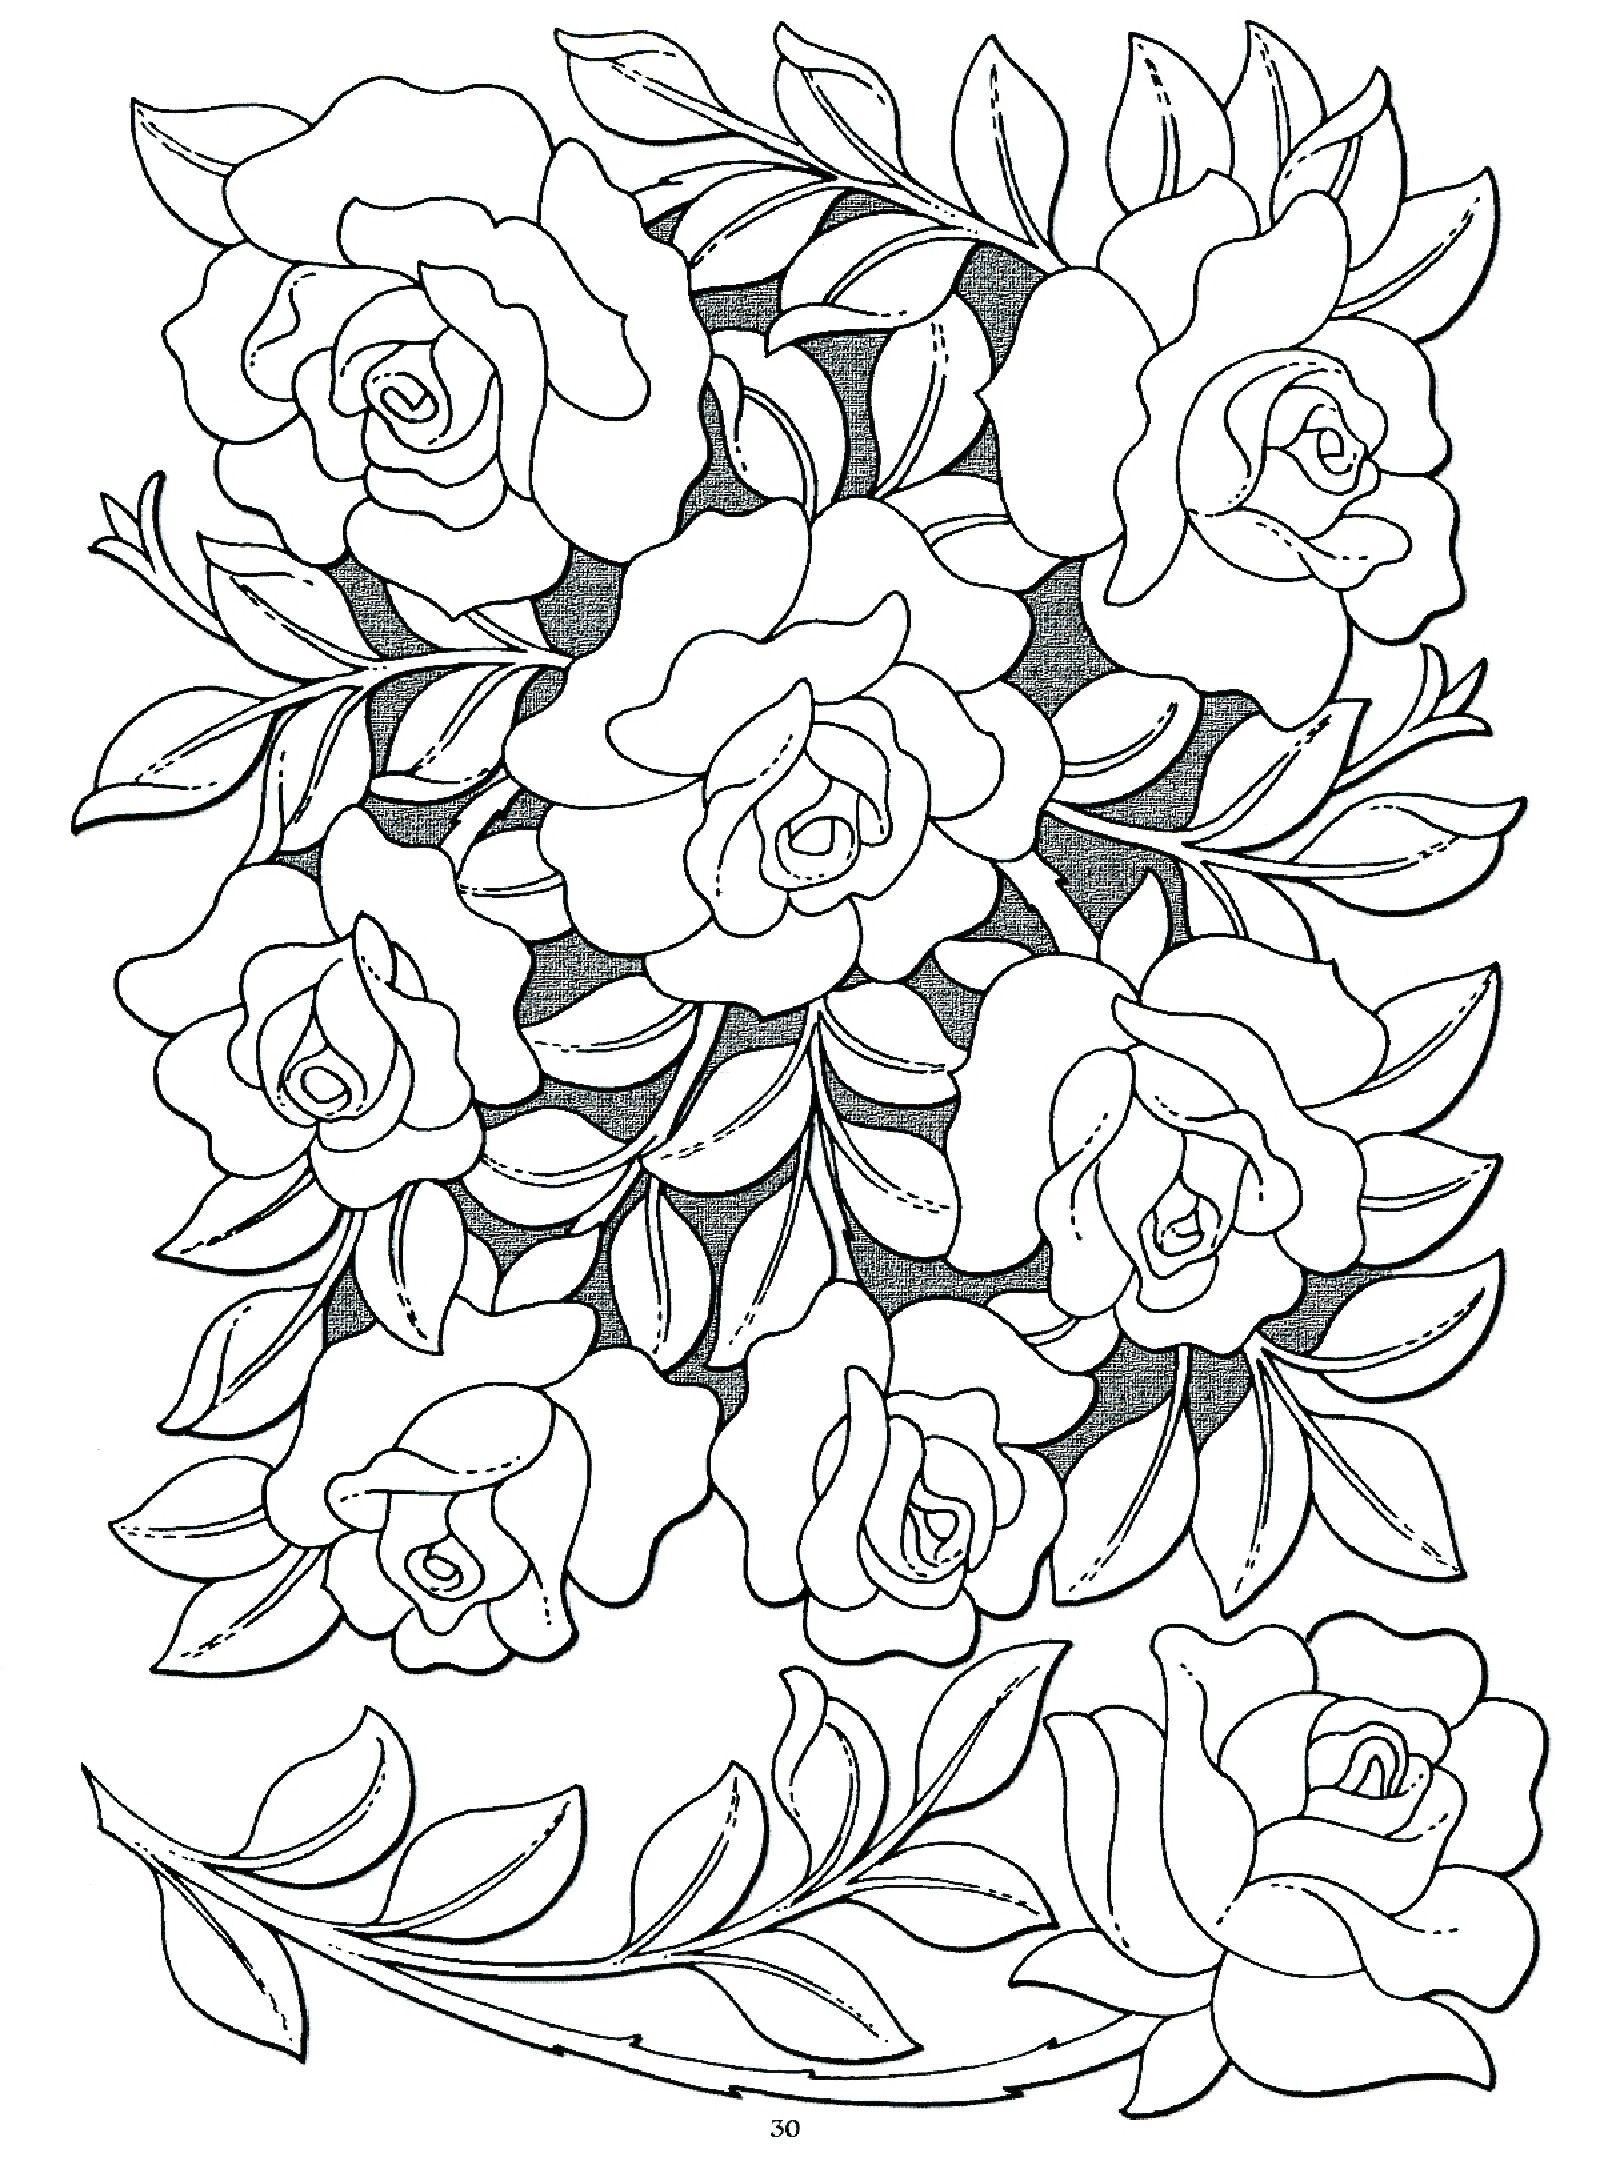 Pin De Anabel En Rosas Pinterest Nähen Malvorlagen Y Punzieren